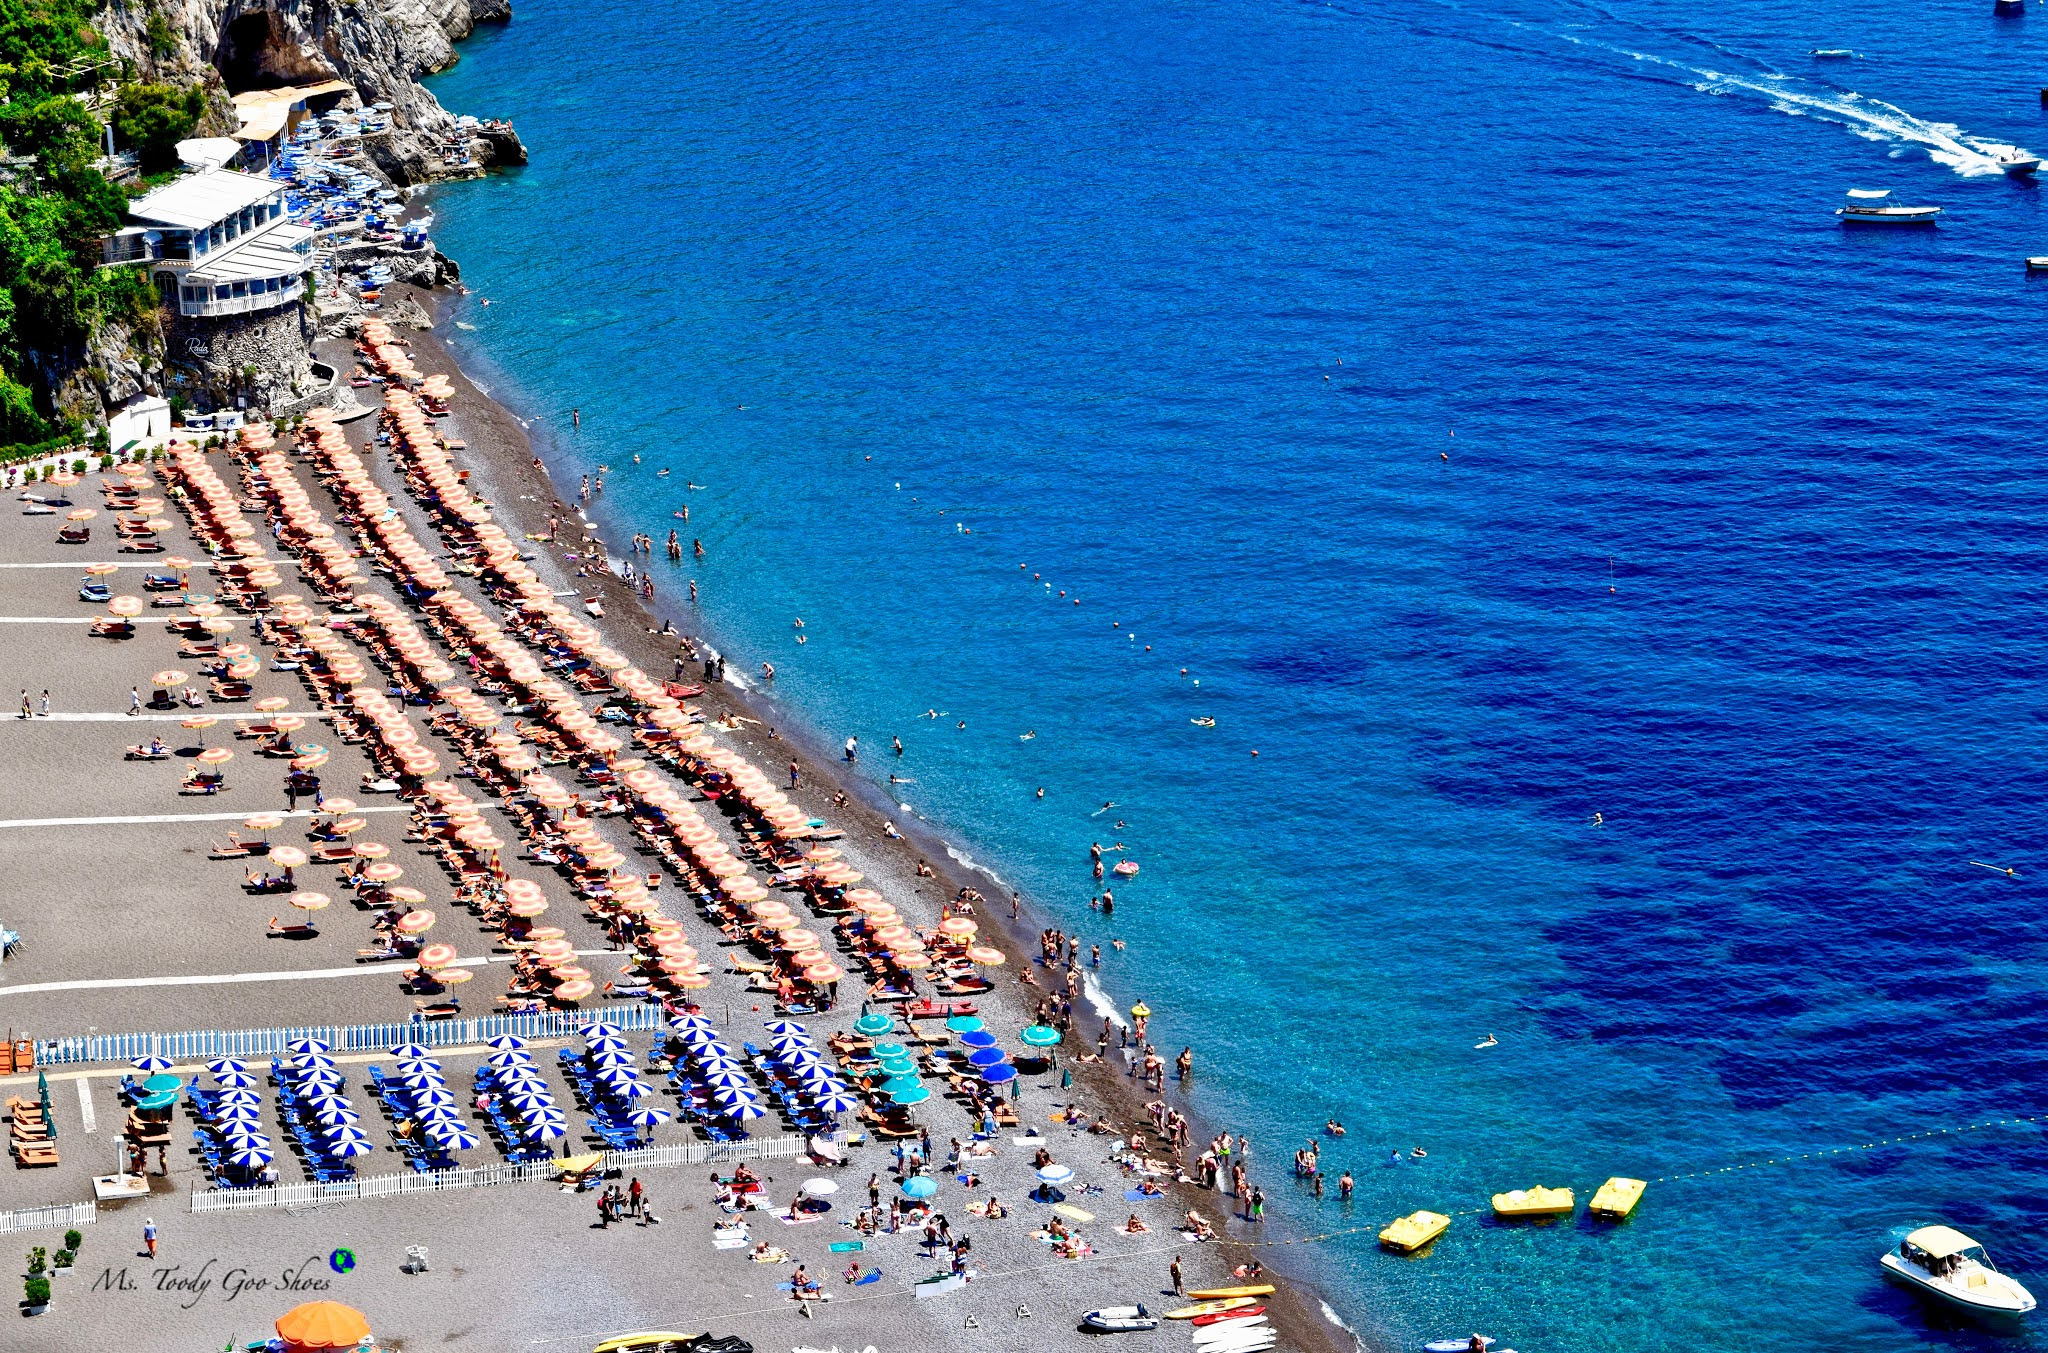 Beach View - Positano, Italy -  Ms. Toody Goo Shoes